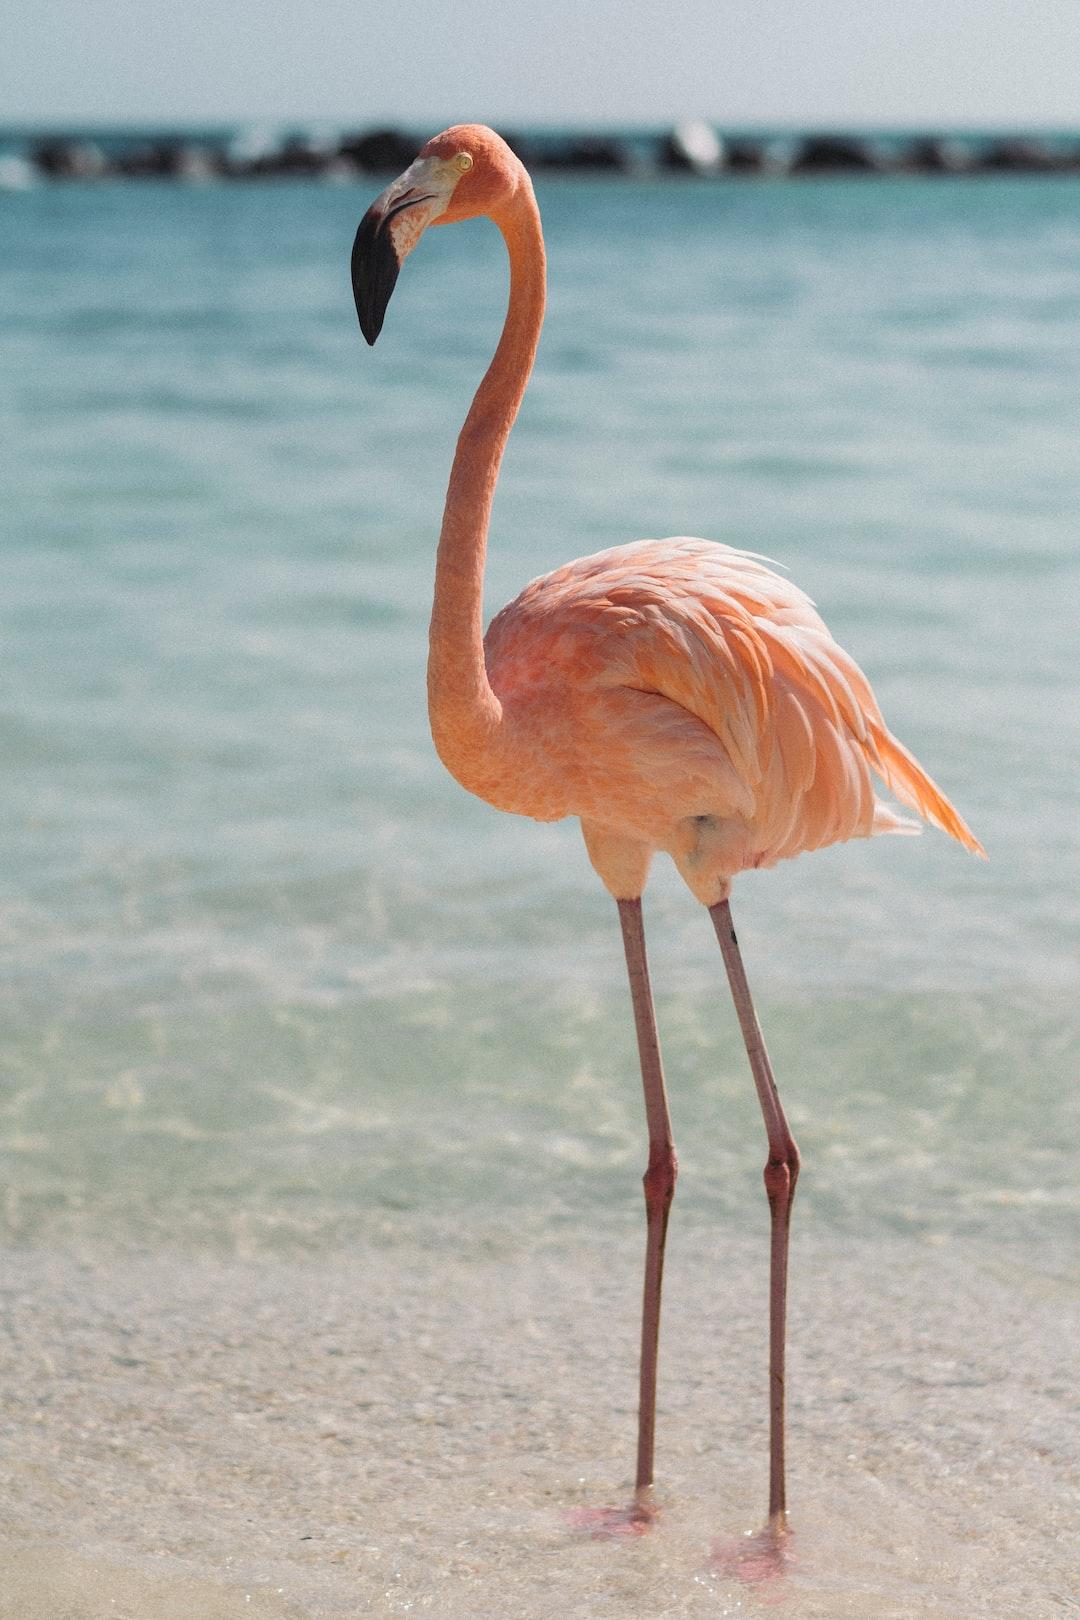 Flamingo Wallpapers Free Hd Download 500 Hq Unsplash